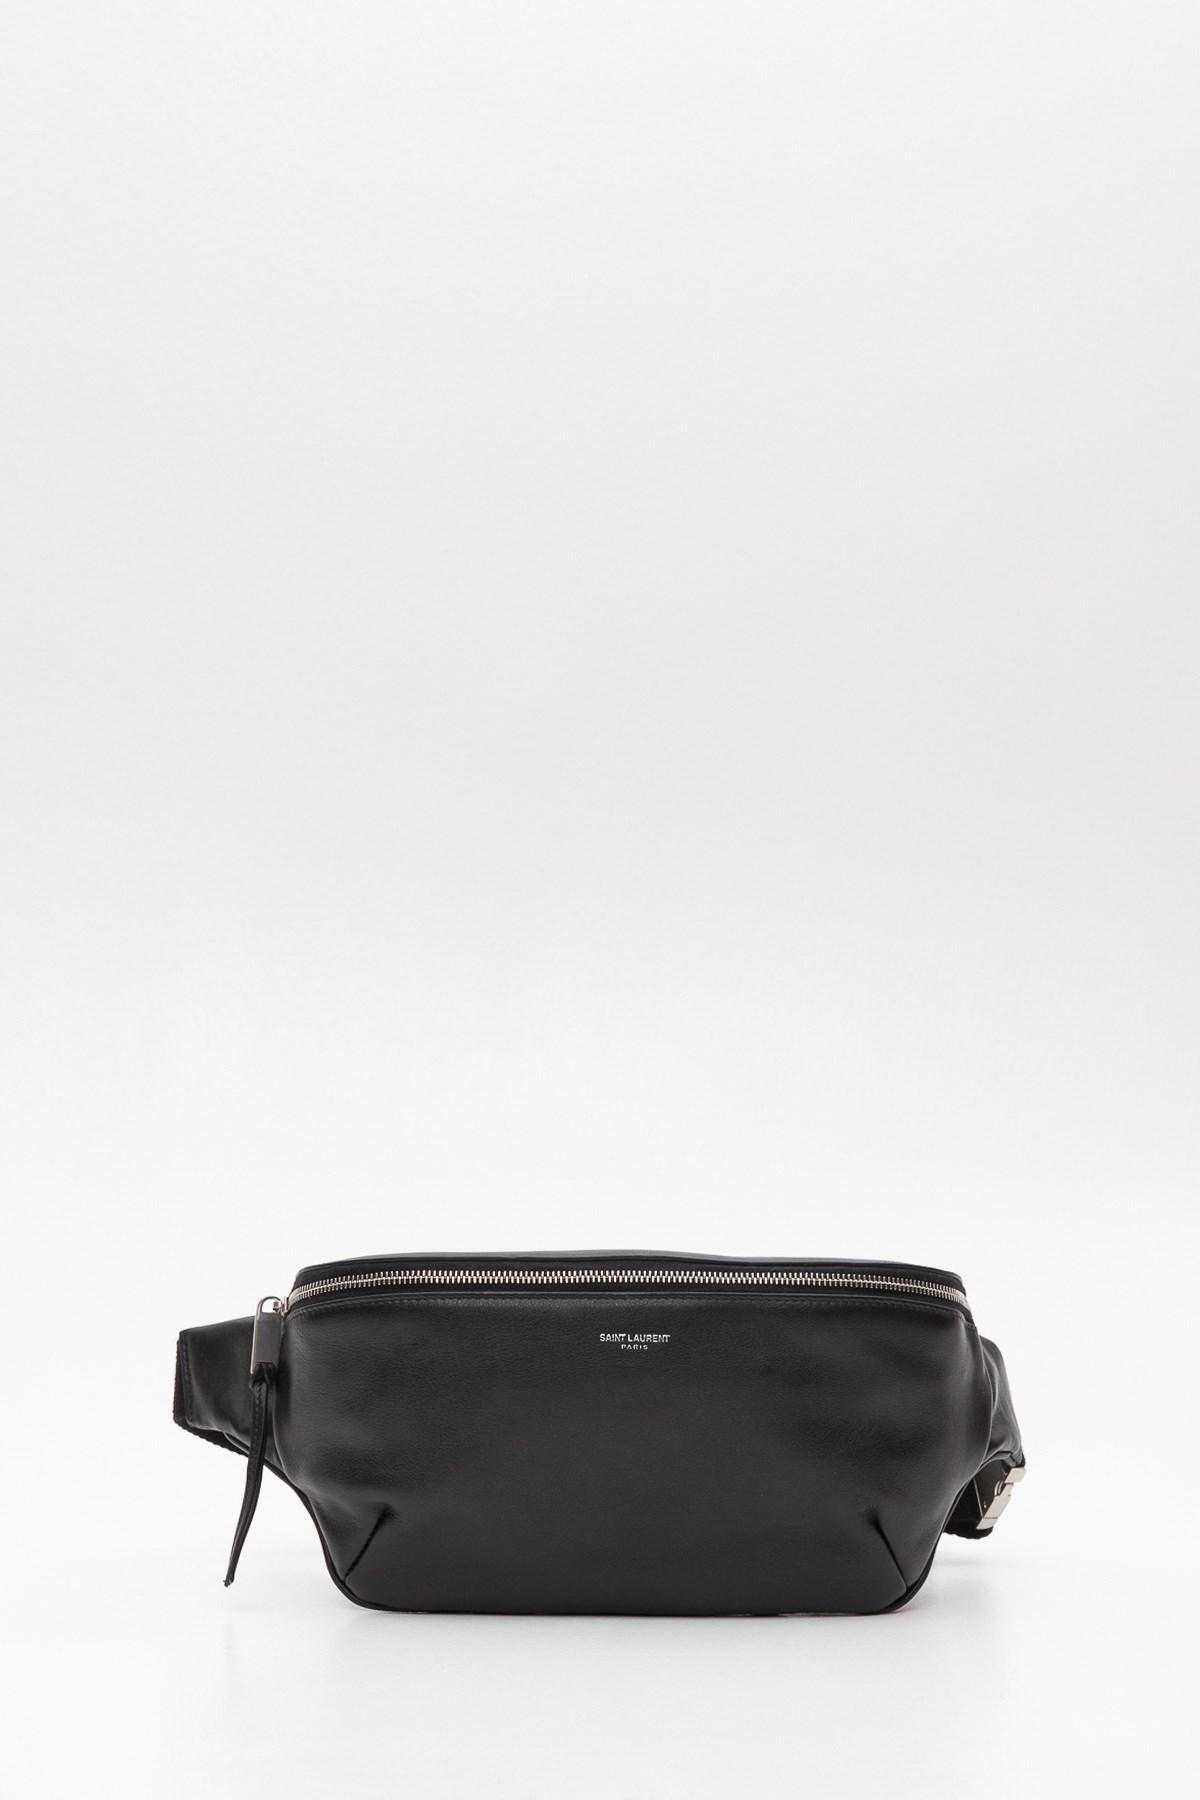 a1de02b291 Saint Laurent Classic Belt Bag In Soft Leather in Black for Men - Lyst